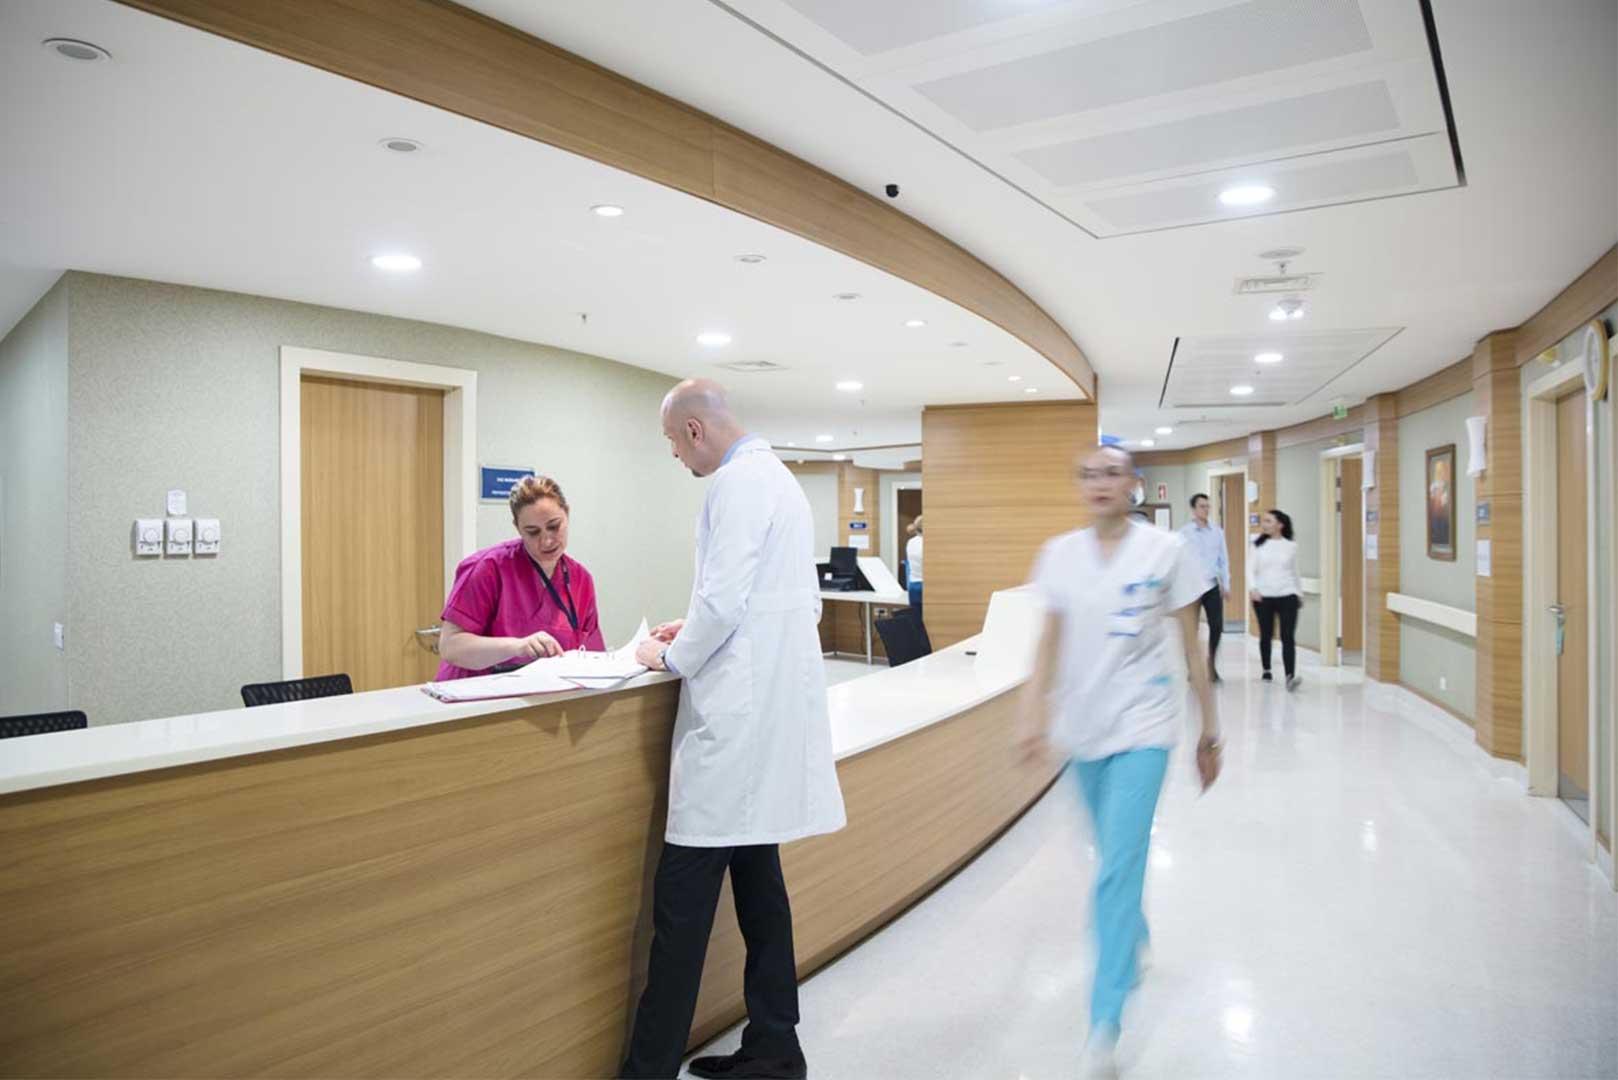 https://www.medicanahealthpoint.com/wp-content/uploads/2020/10/medicana-international-istanbul-18.jpg